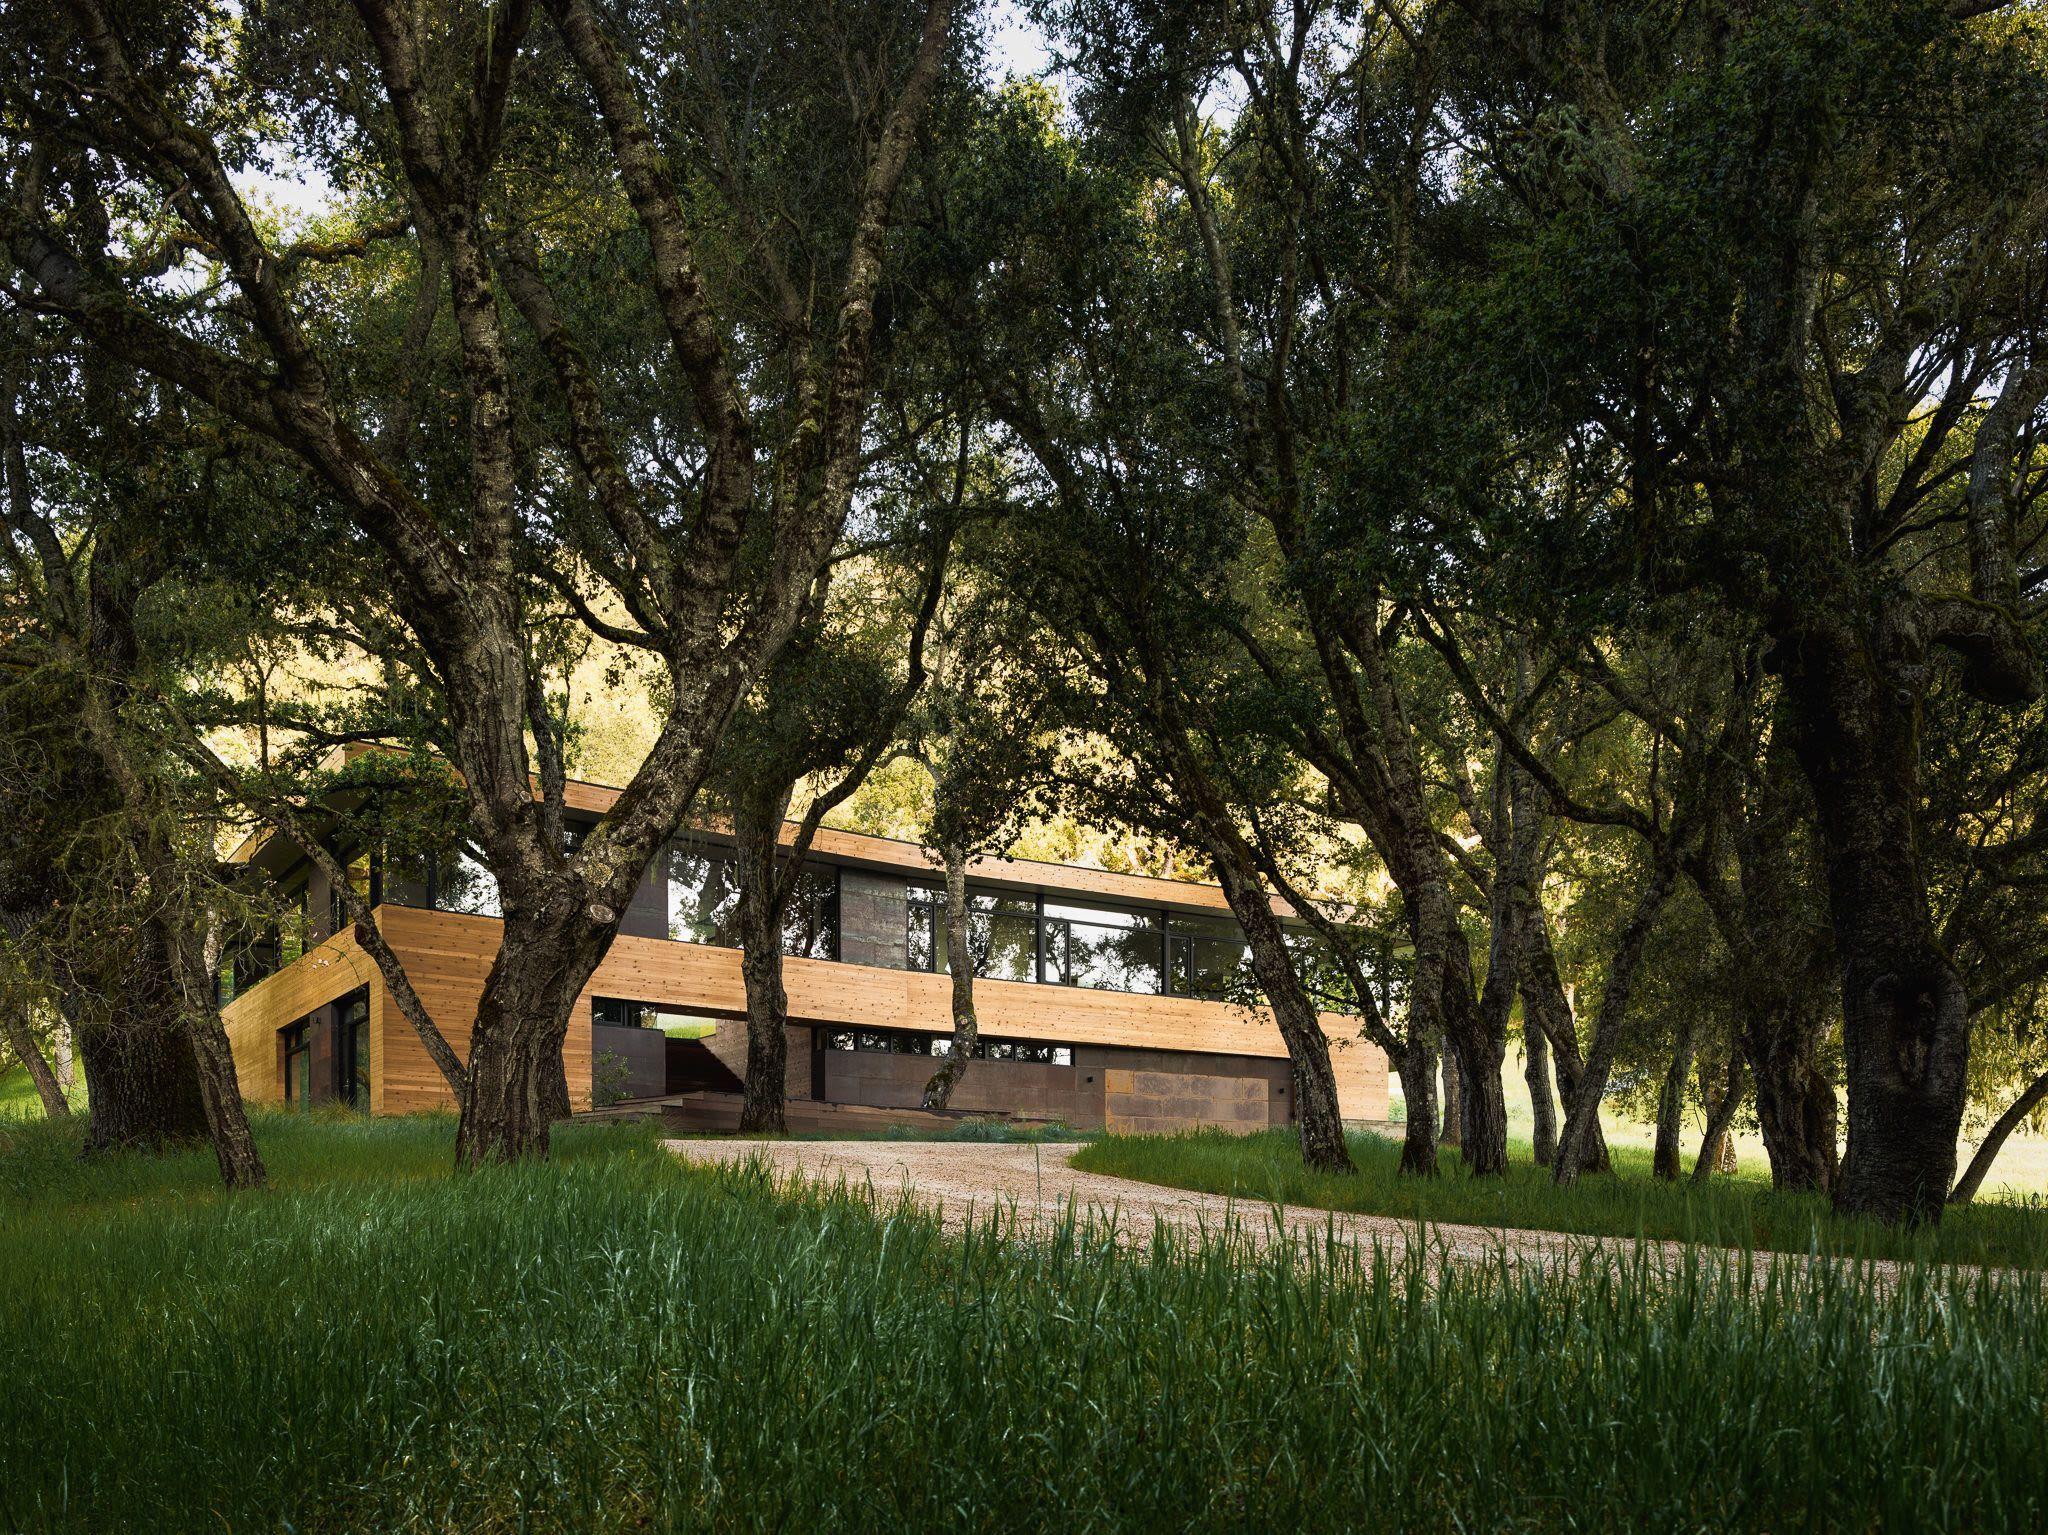 Joe Fletcher Photography | California homes, Architecture ...